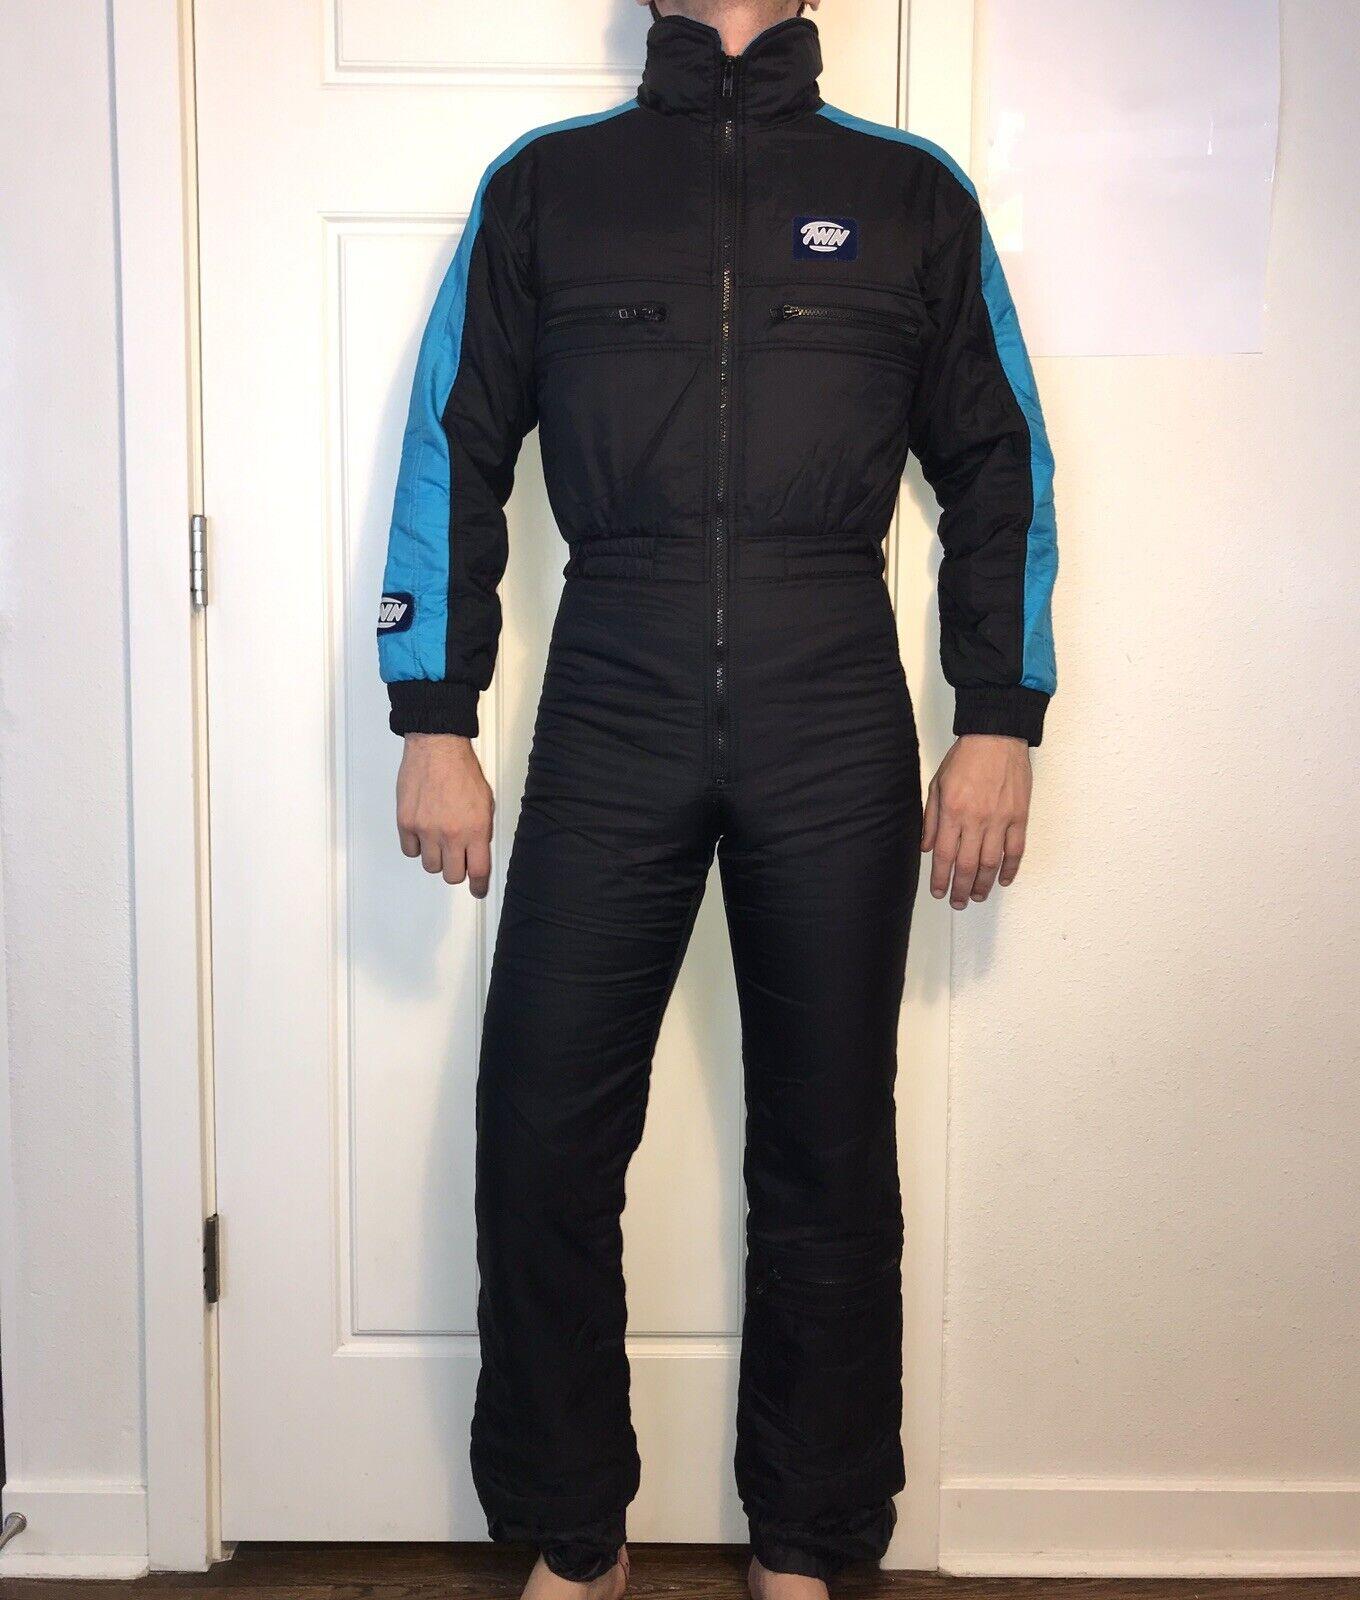 Vtg Vtg Vtg 70s 80s TWN damen MEDIUM One piece SKI SUIT Snow Bib Snowsuit Neon Blau M 1af4ee